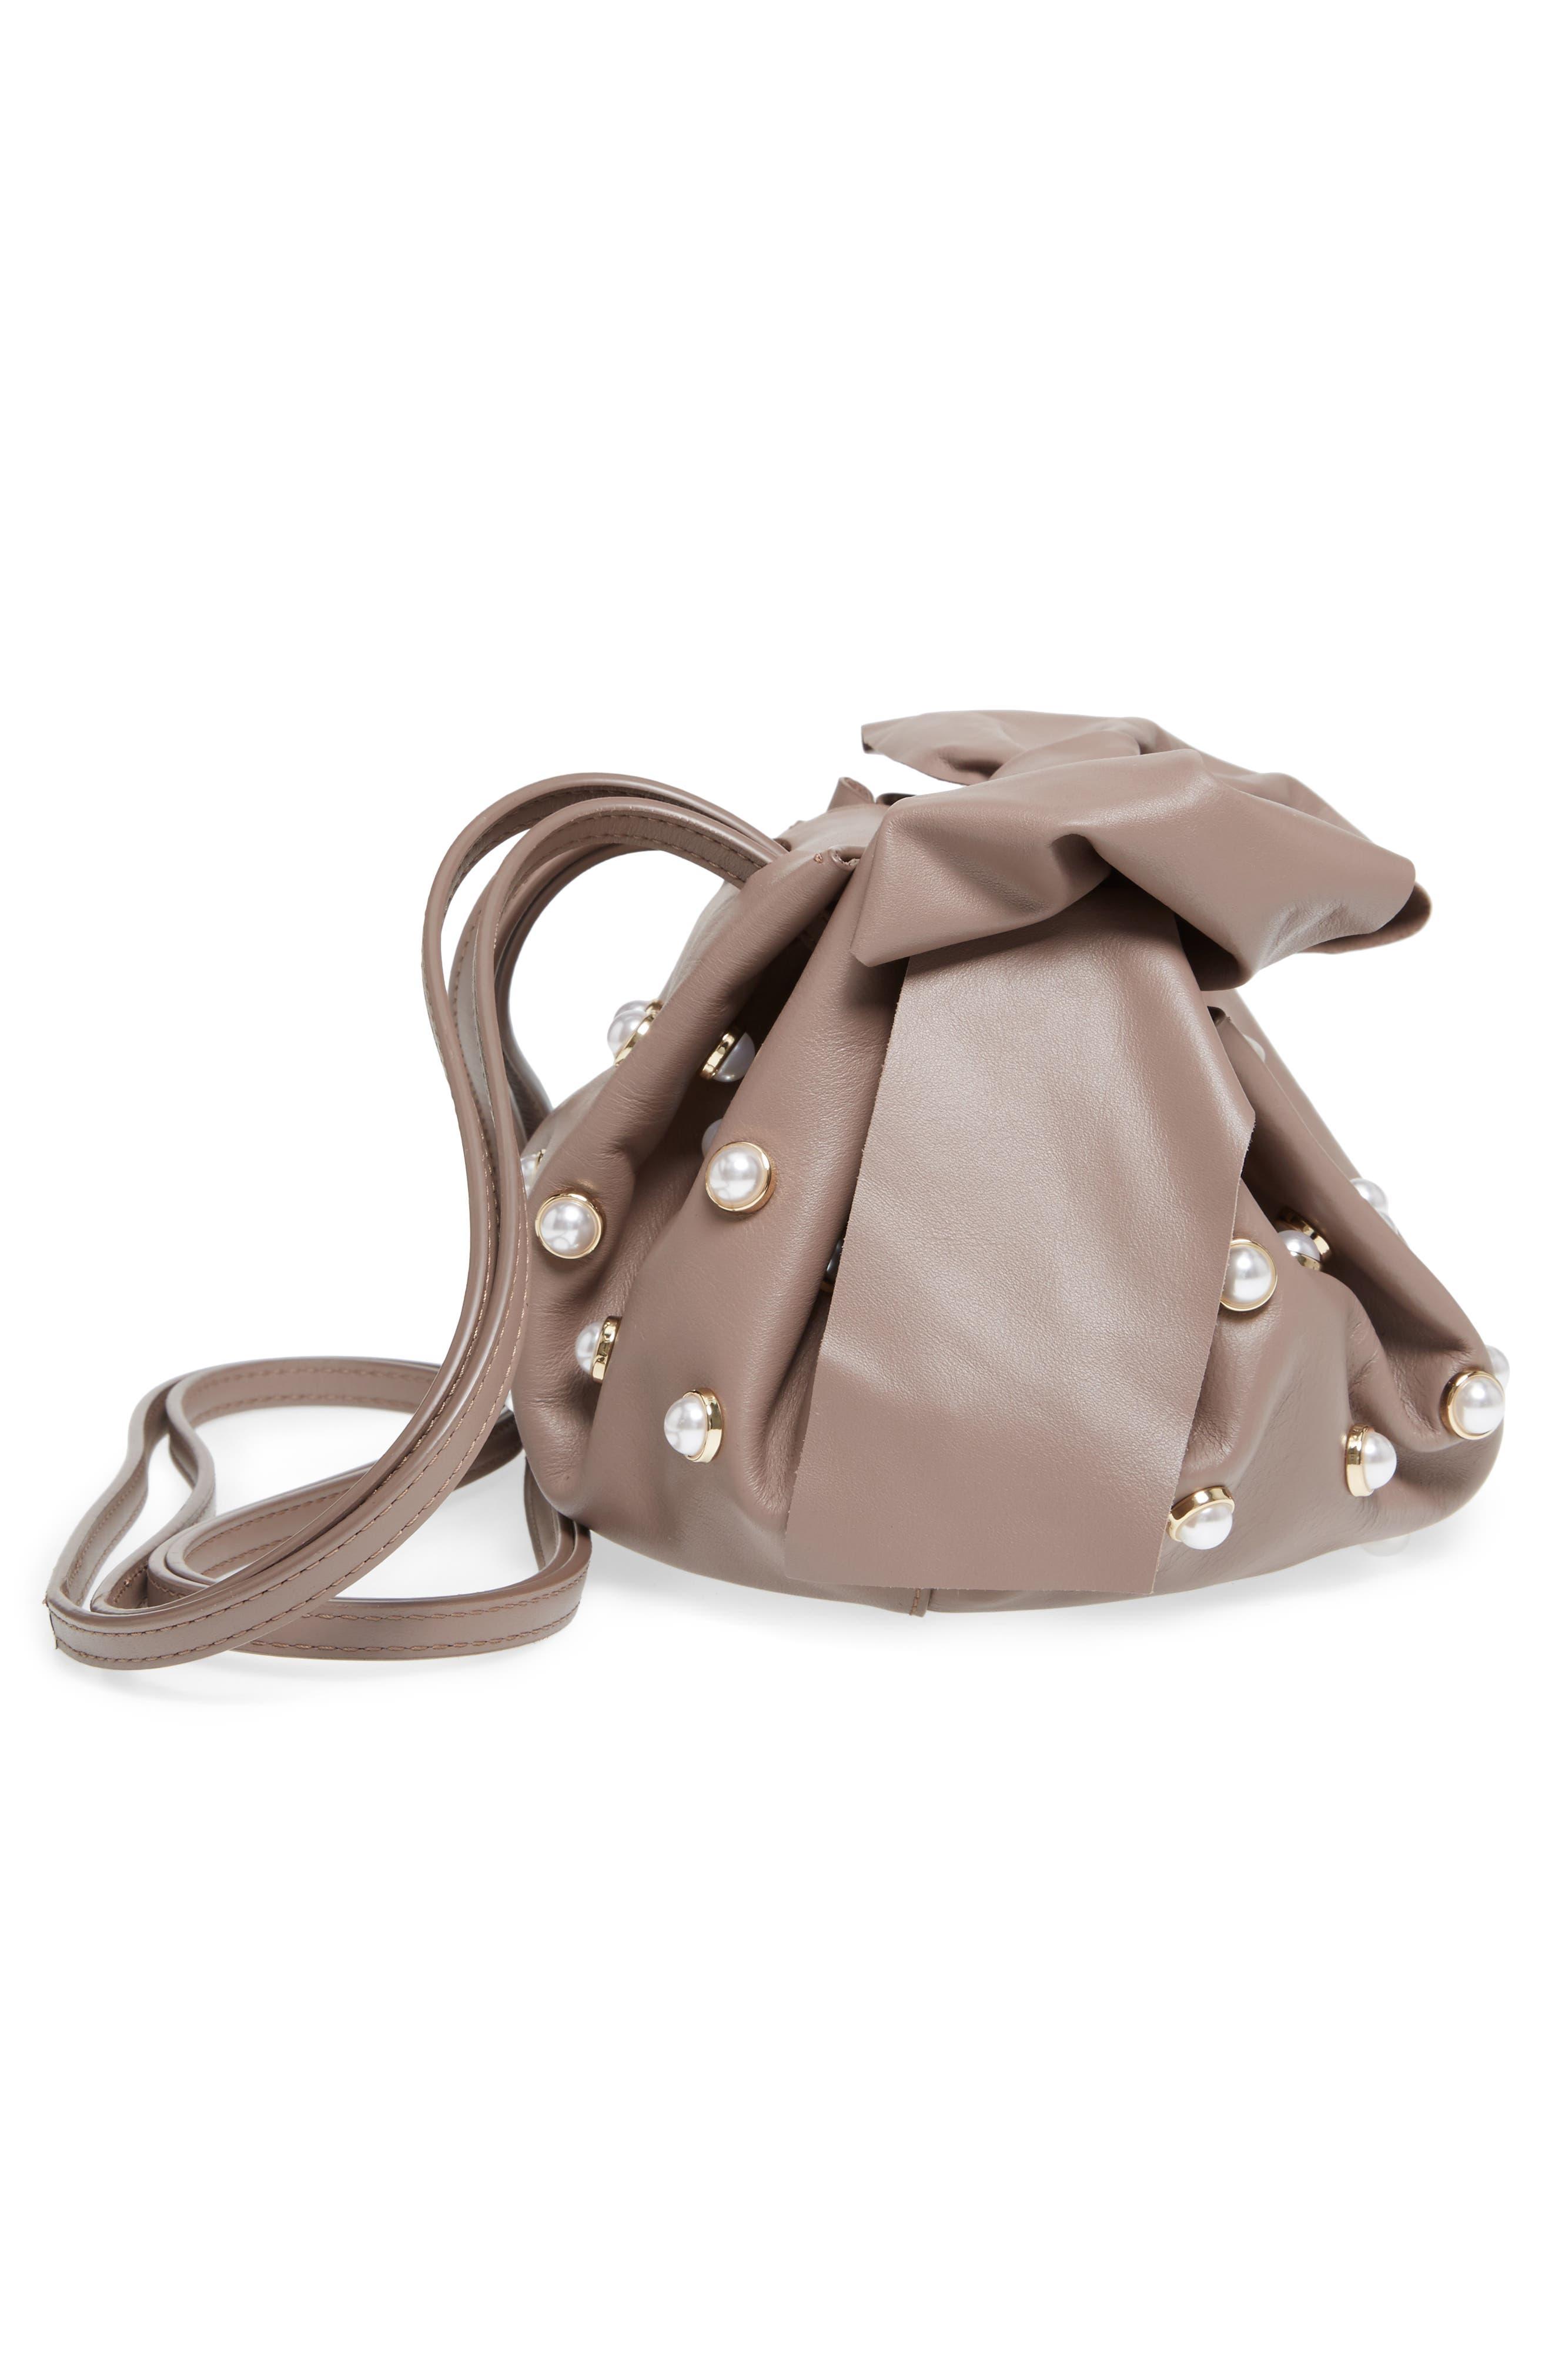 Soirée Imitation Pearl Lady Leather Crossbody Bag,                             Alternate thumbnail 5, color,                             530